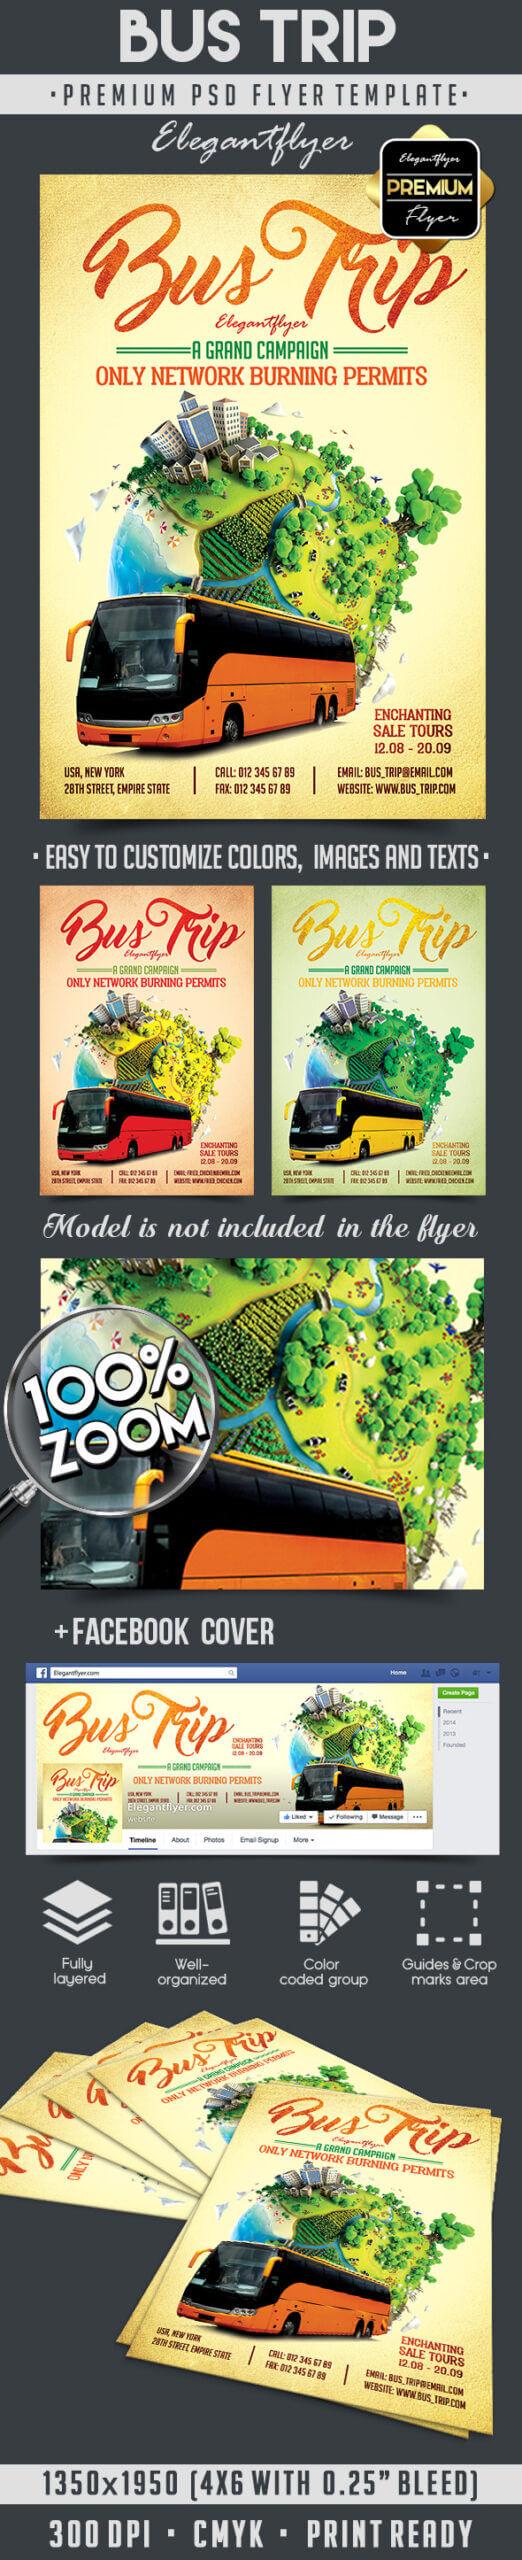 Bus Trip Flyer Inside Bus Trip Flyer Templates Free